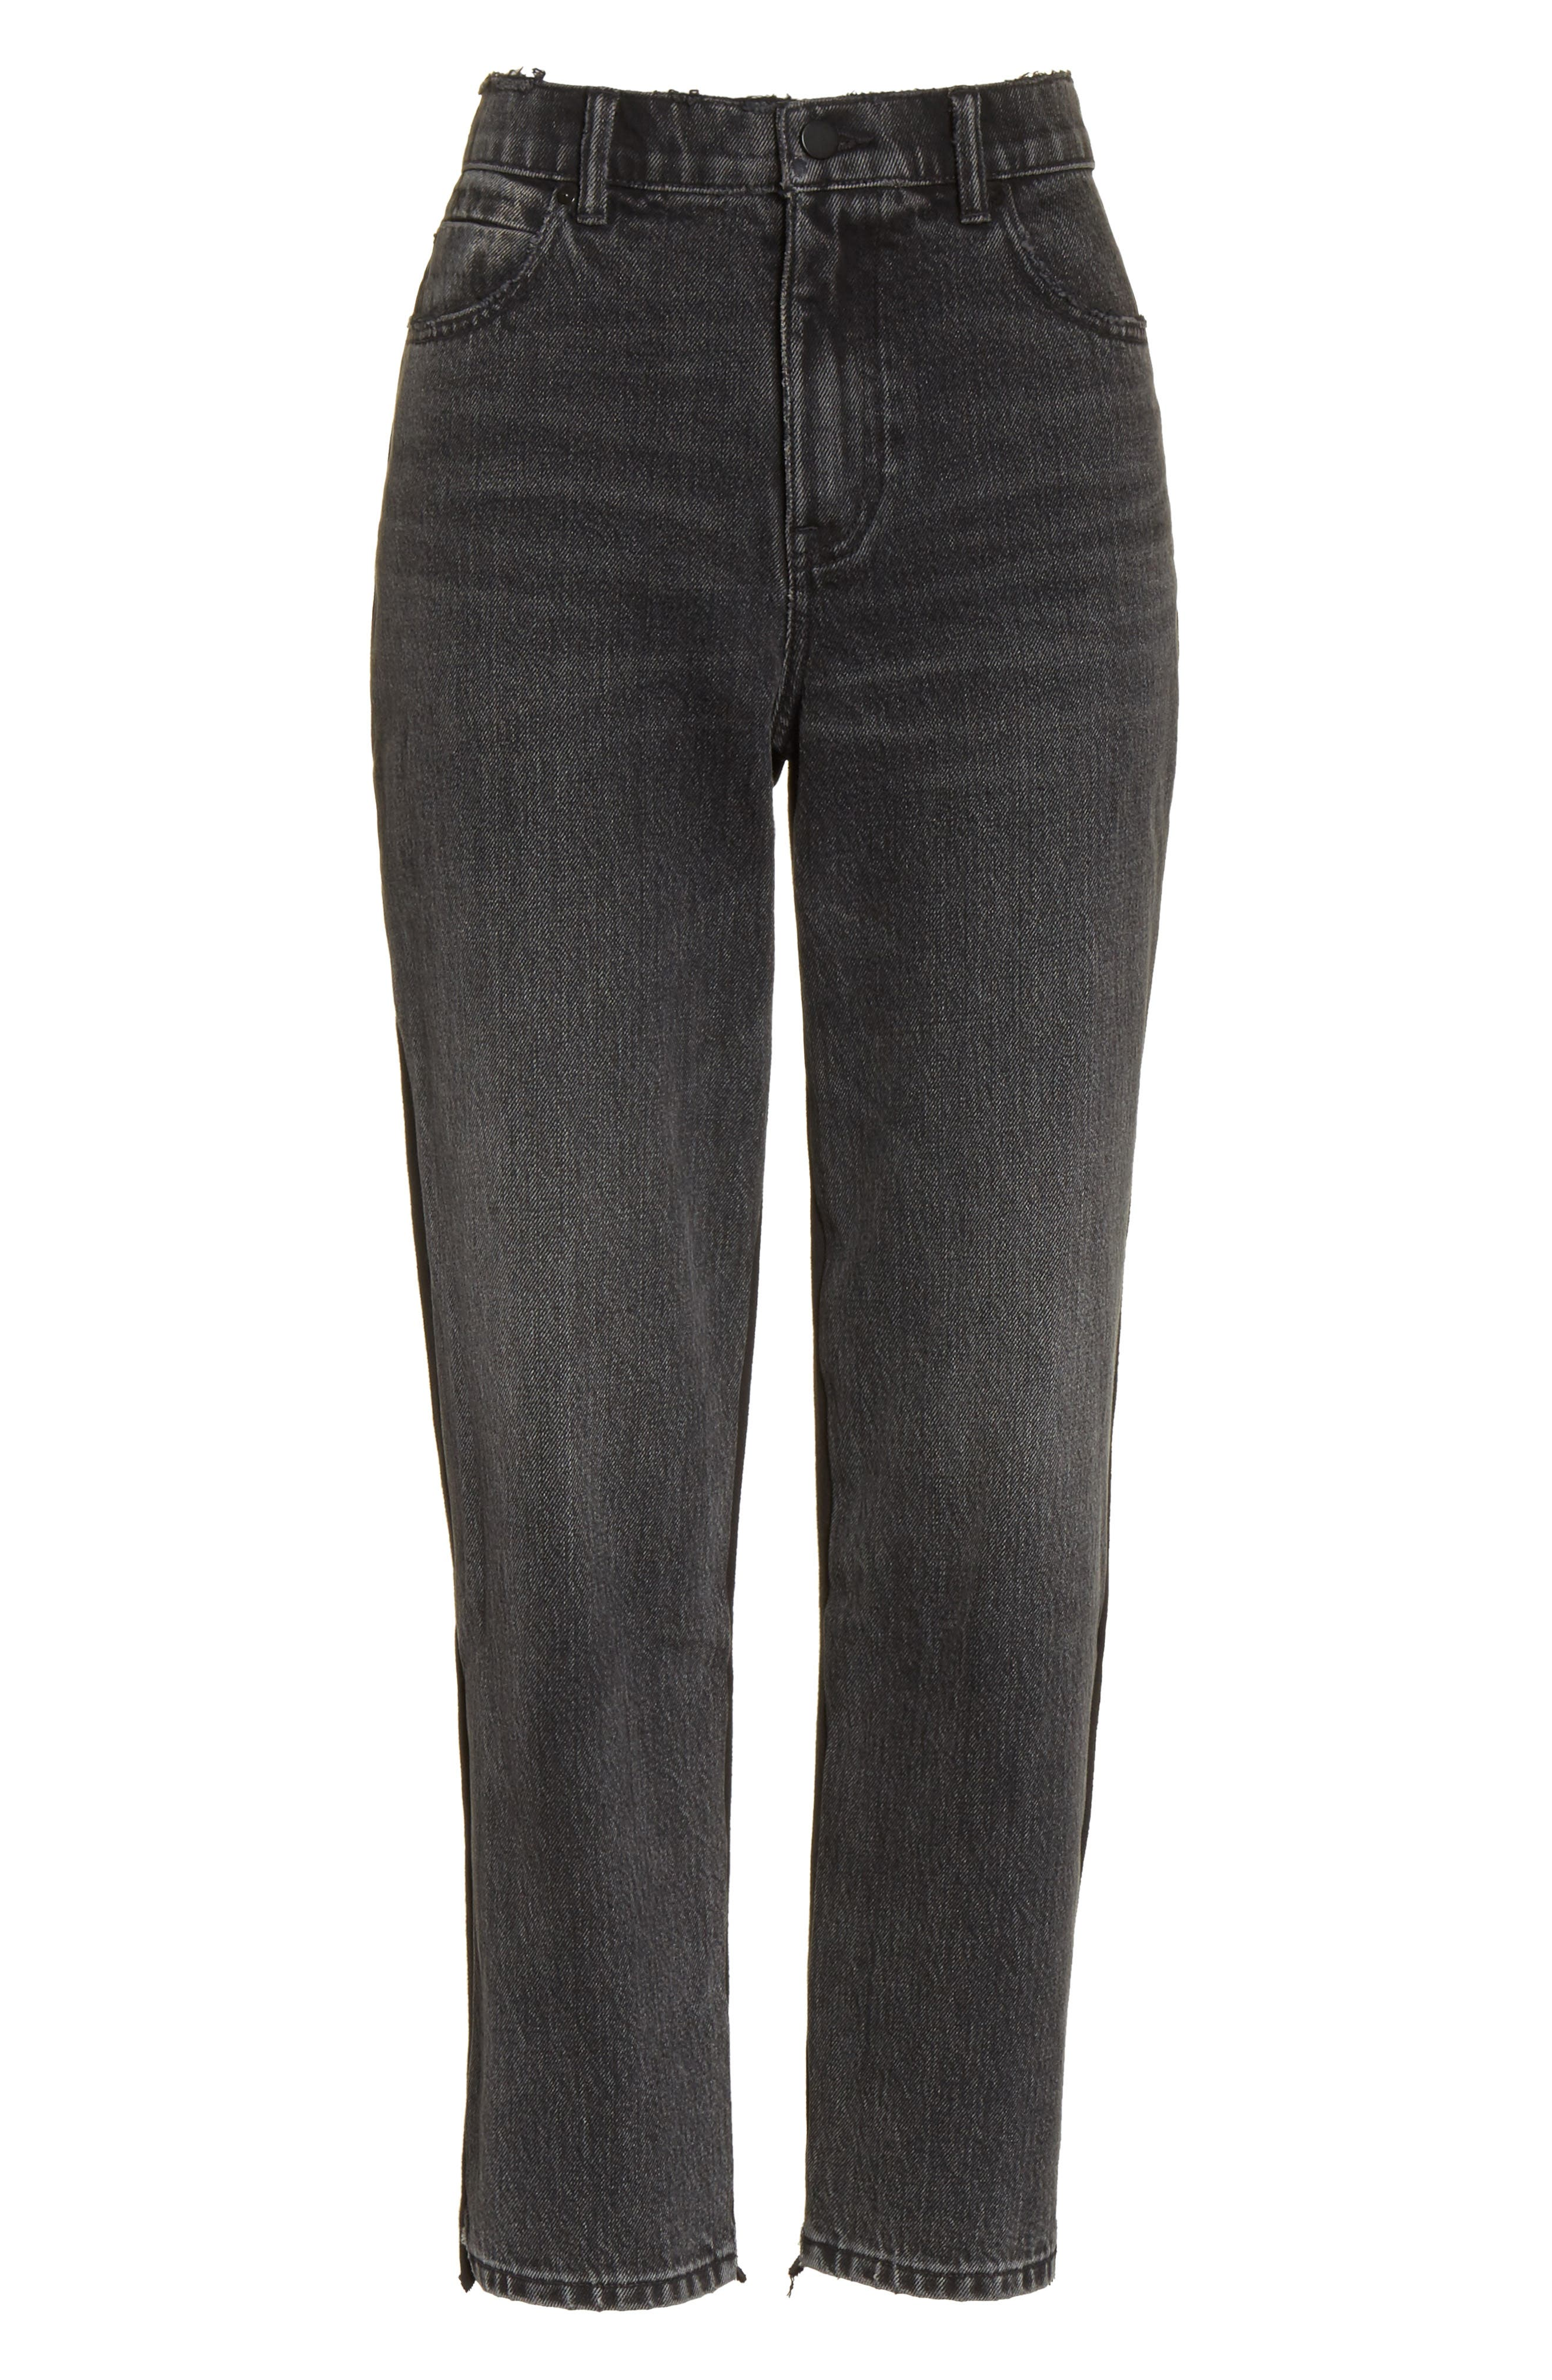 Denim x Alexander Wang Hybrid Sweatpants Jeans,                             Alternate thumbnail 6, color,                             025